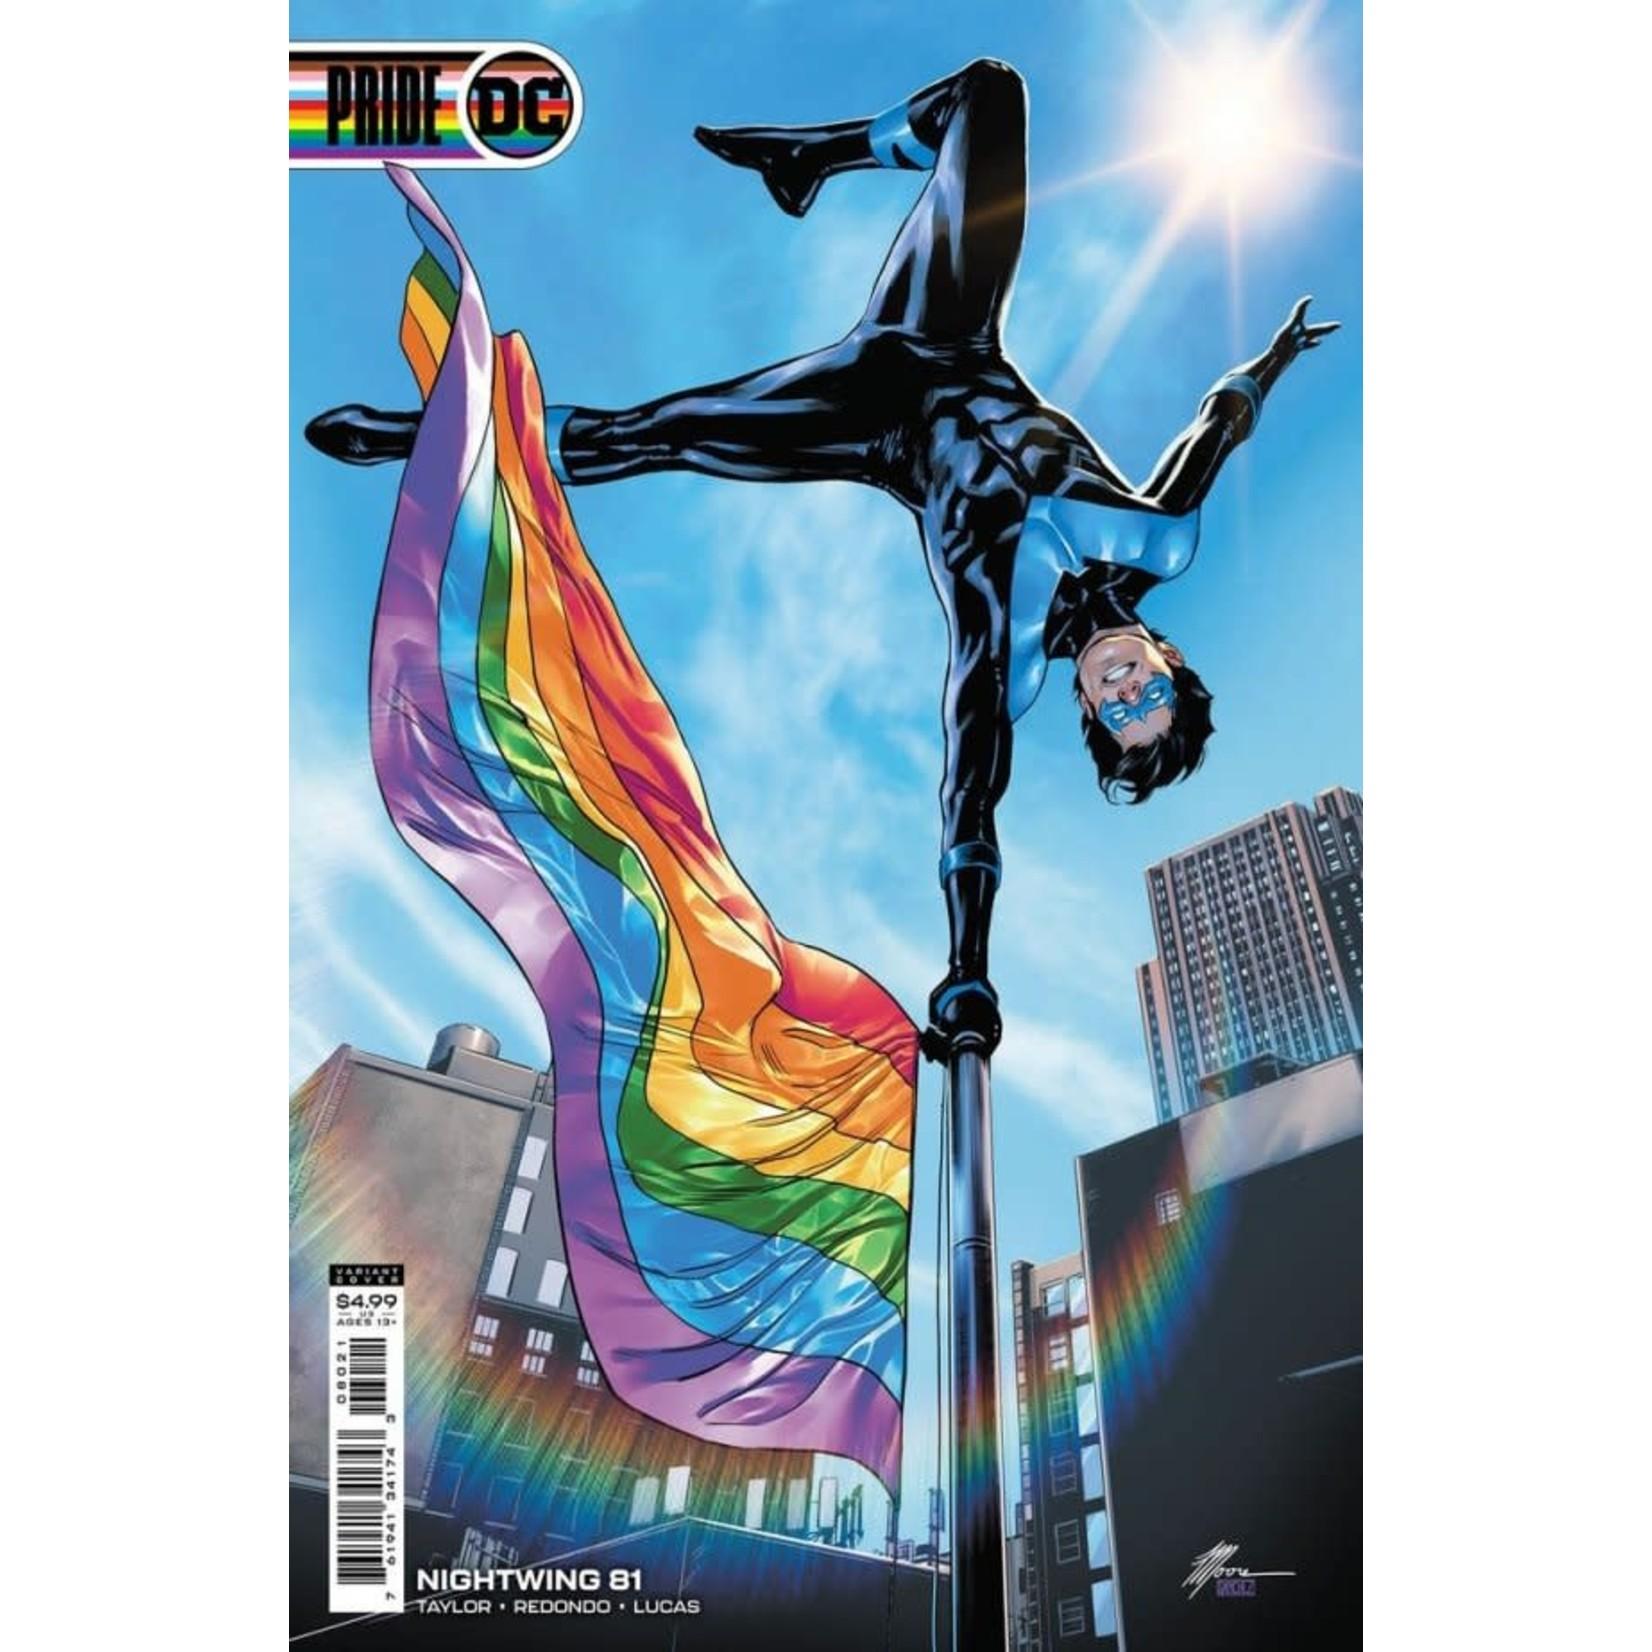 DC Comics NIGHTWING #81 CVR C RAVIS MOORE PRIDE  MONTH